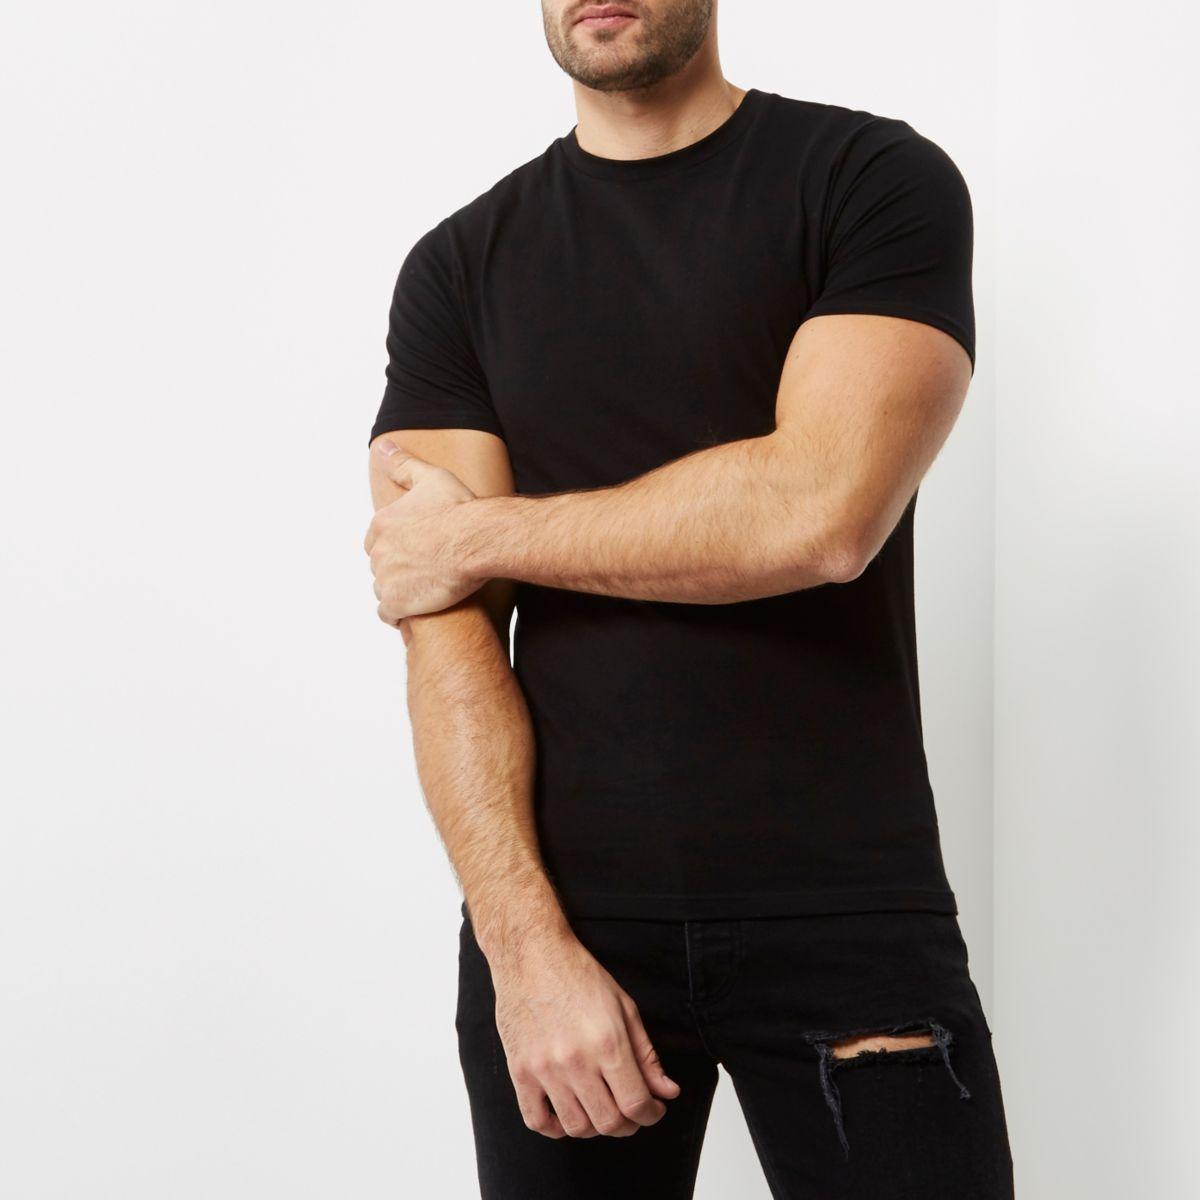 Black muscle fit crew neck T-shirt - T-shirts - T-Shirts & Tanks - men